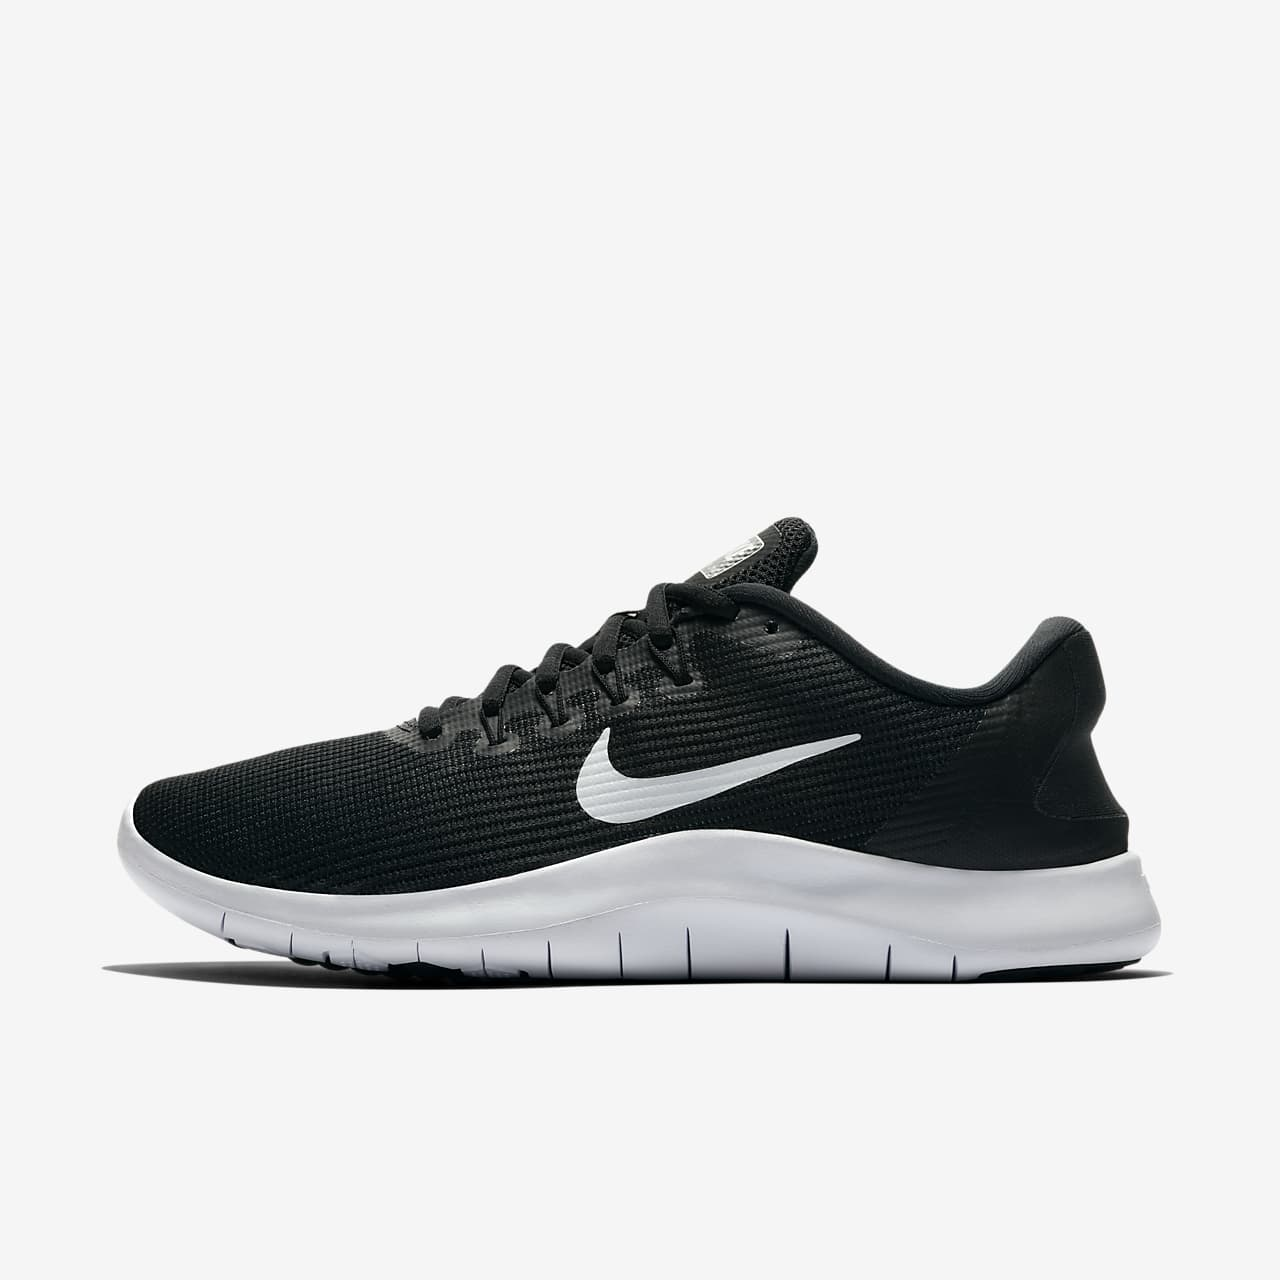 Sapatilhas de running Nike Flex RN 2018 para mulher